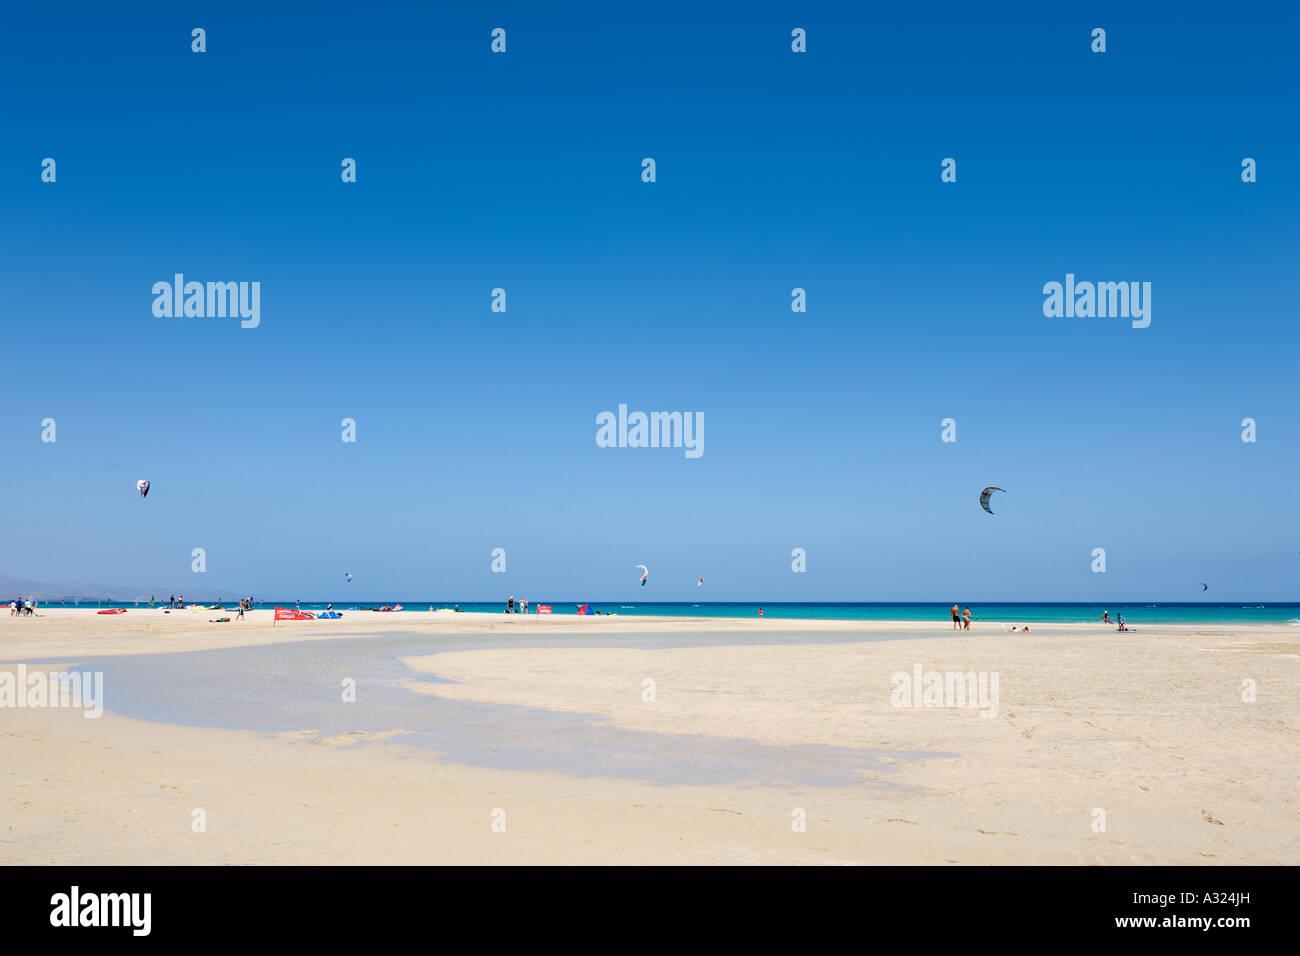 Kitesurfing on Playa Barca beach, Costa Calma, Fuerteventura, Canary Islands, Spain - Stock Image